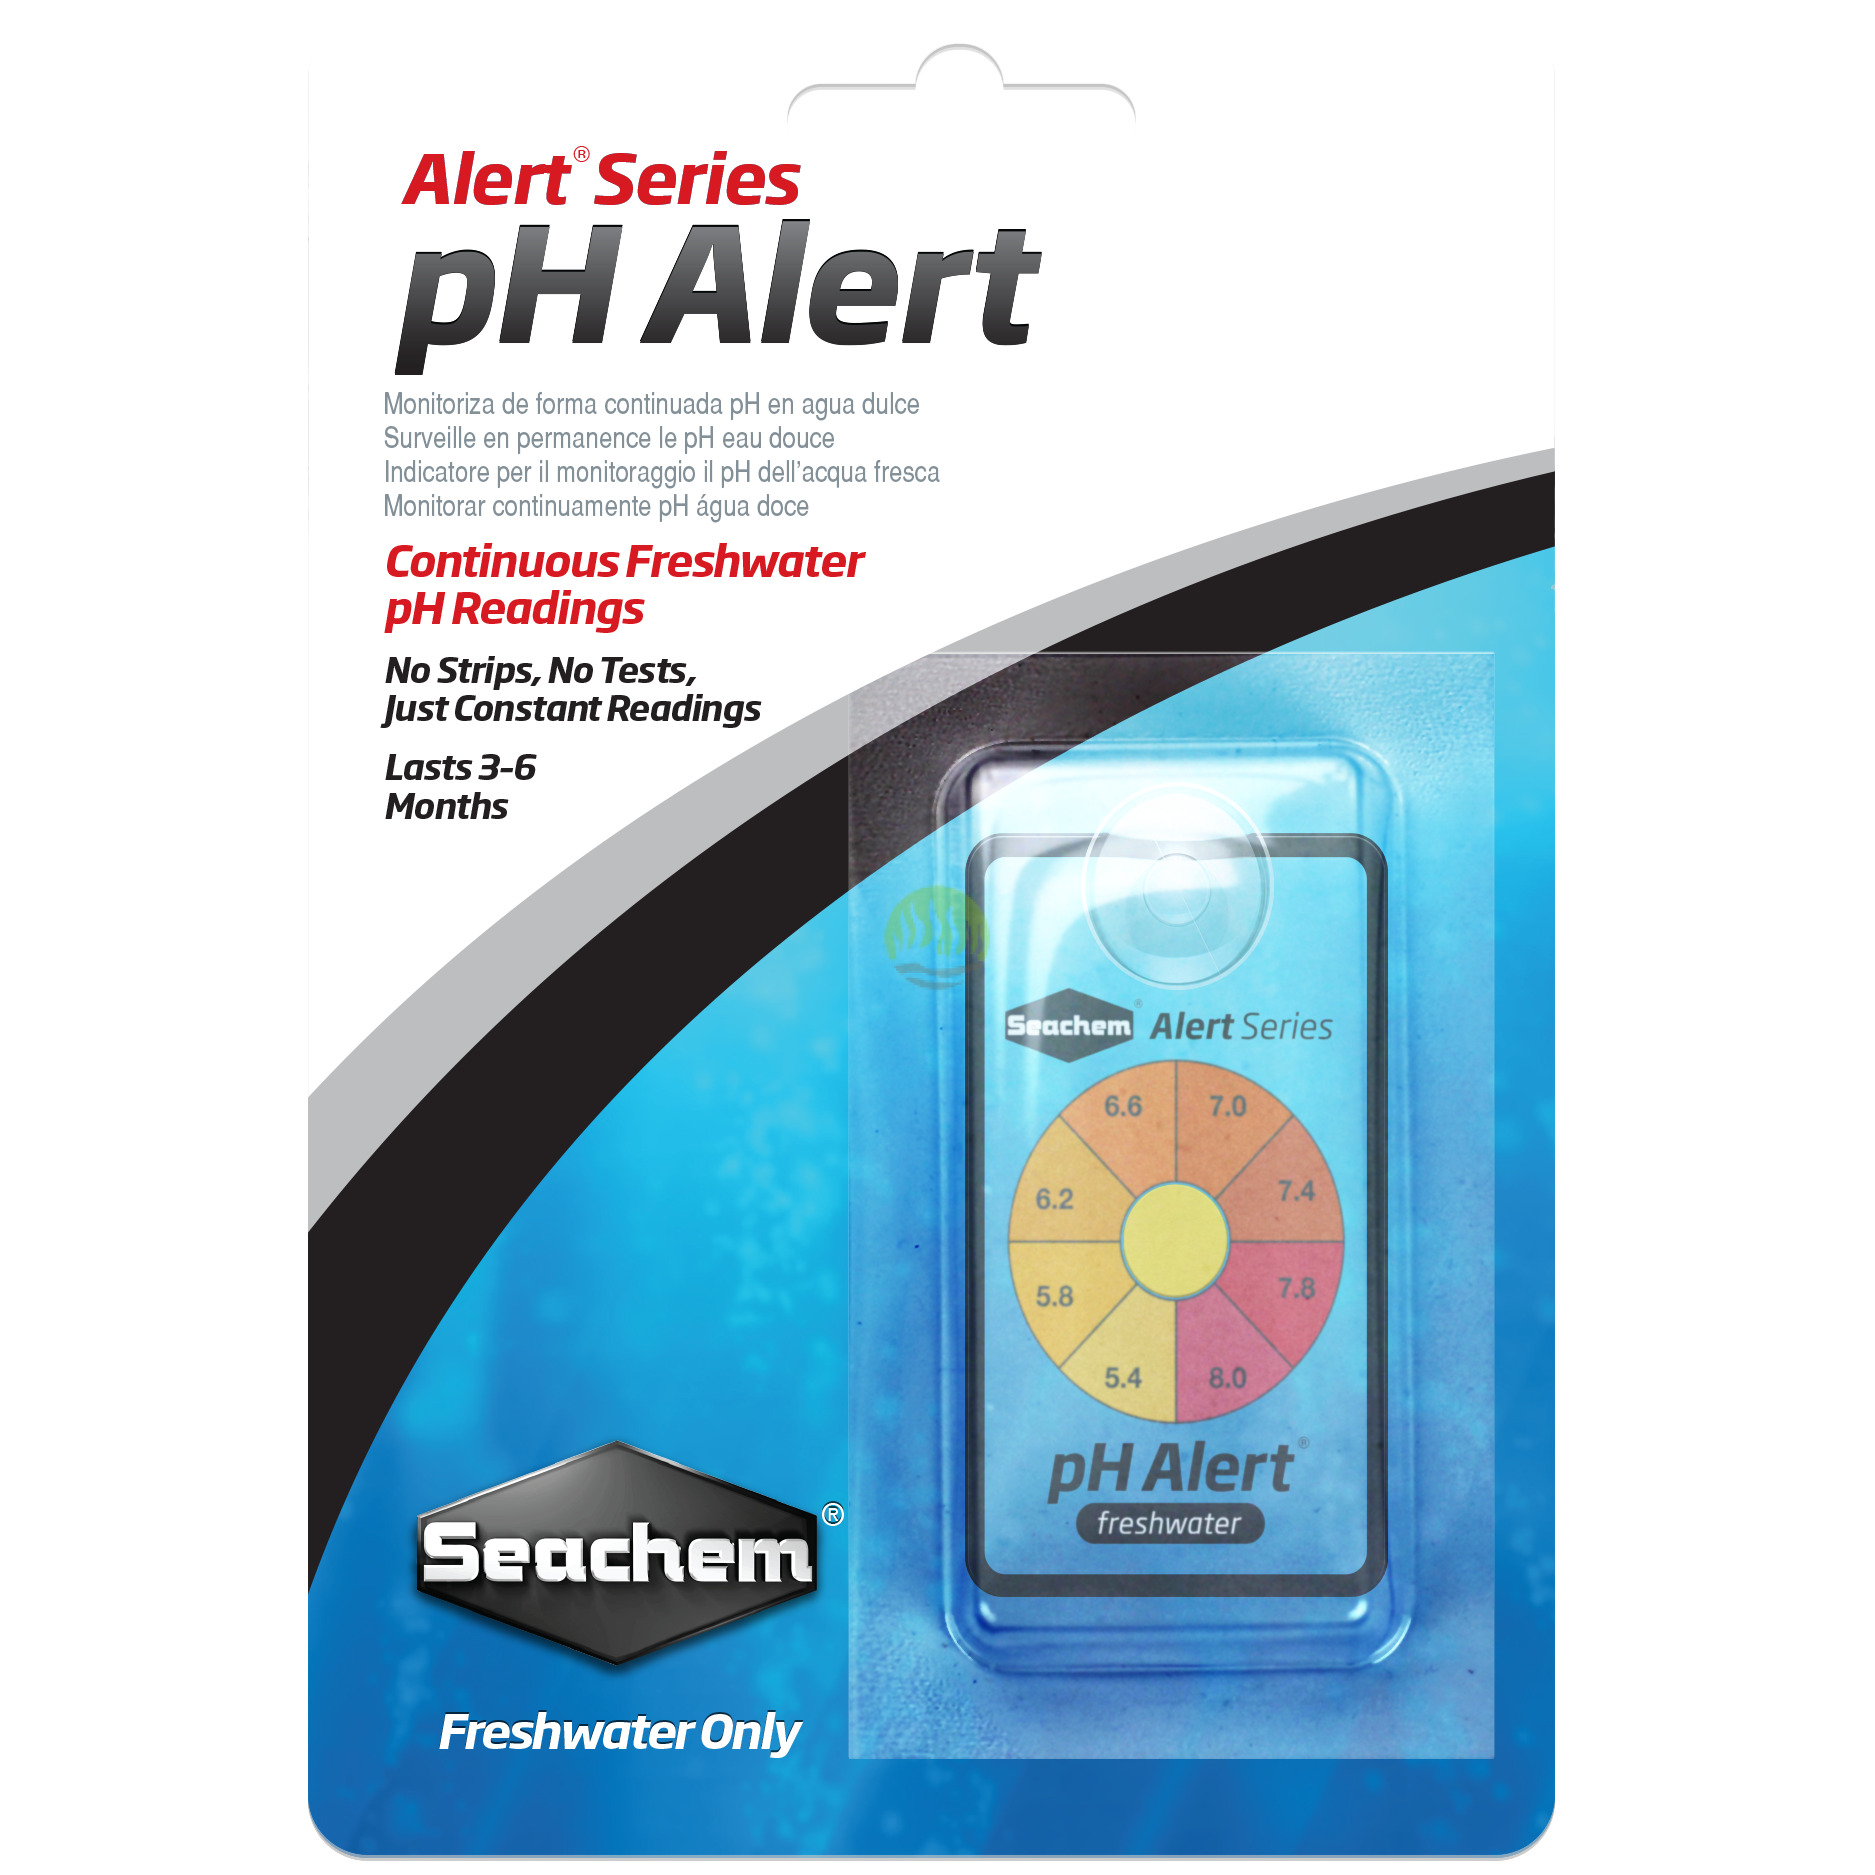 how to use seachem ph alert